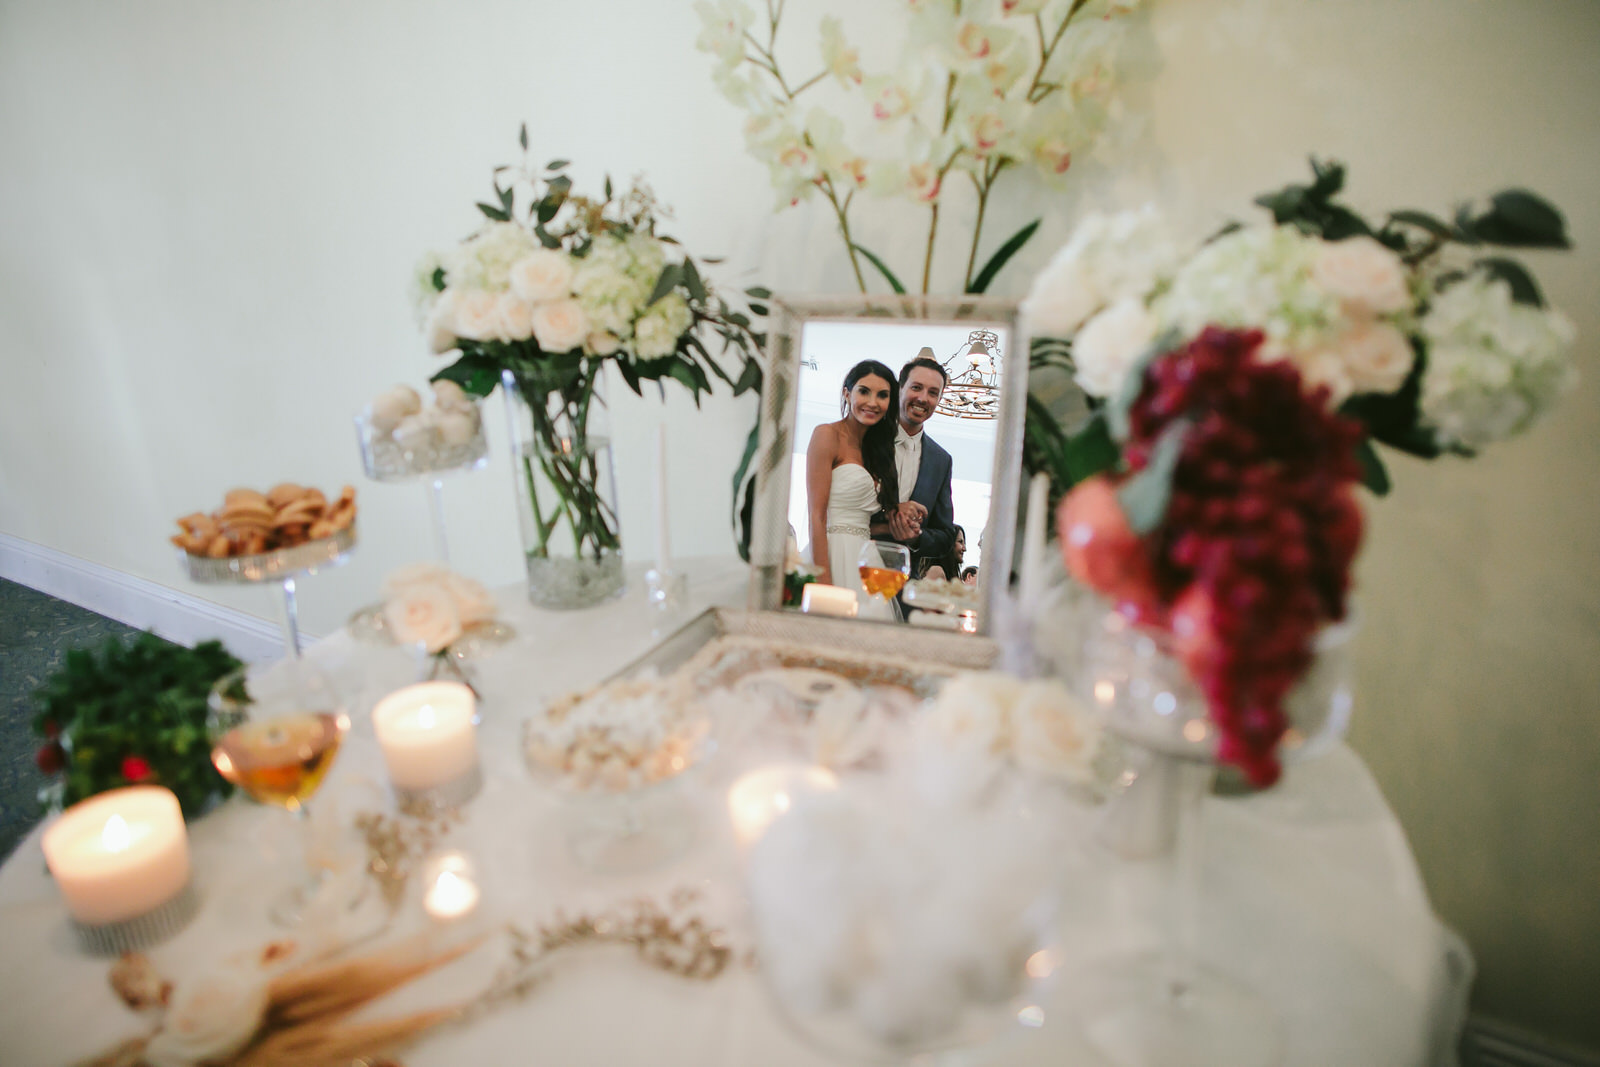 jensen_beach_wedding_persian_ceremony-61.jpg